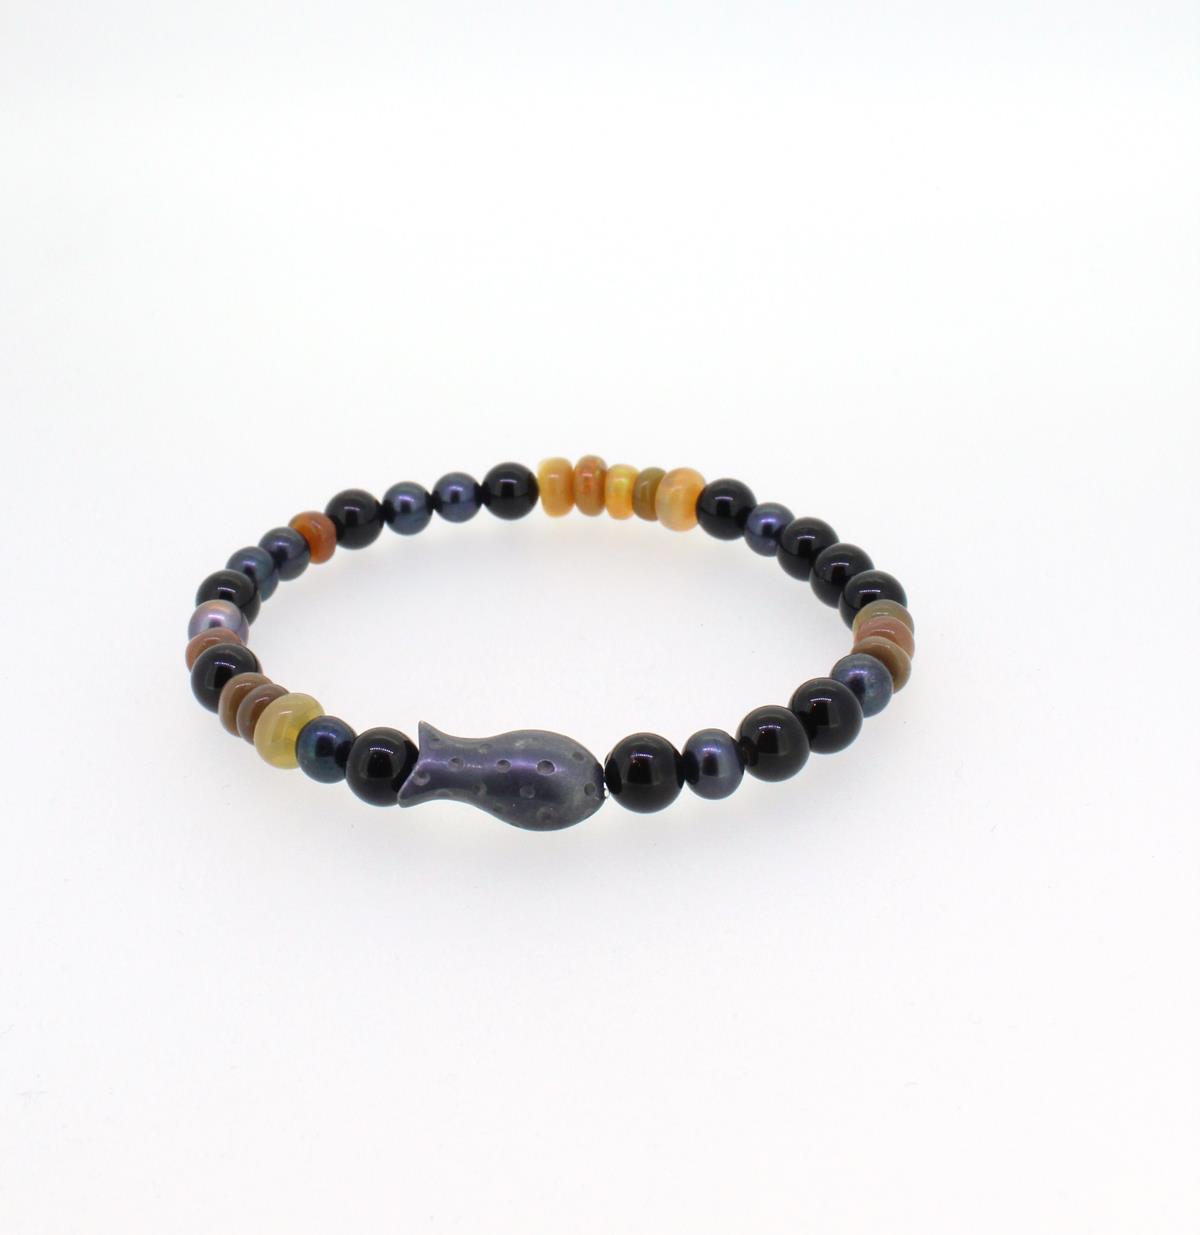 Armband Fische Silber Onyx Perlen Opal - Sabine Scheuble - f94194so